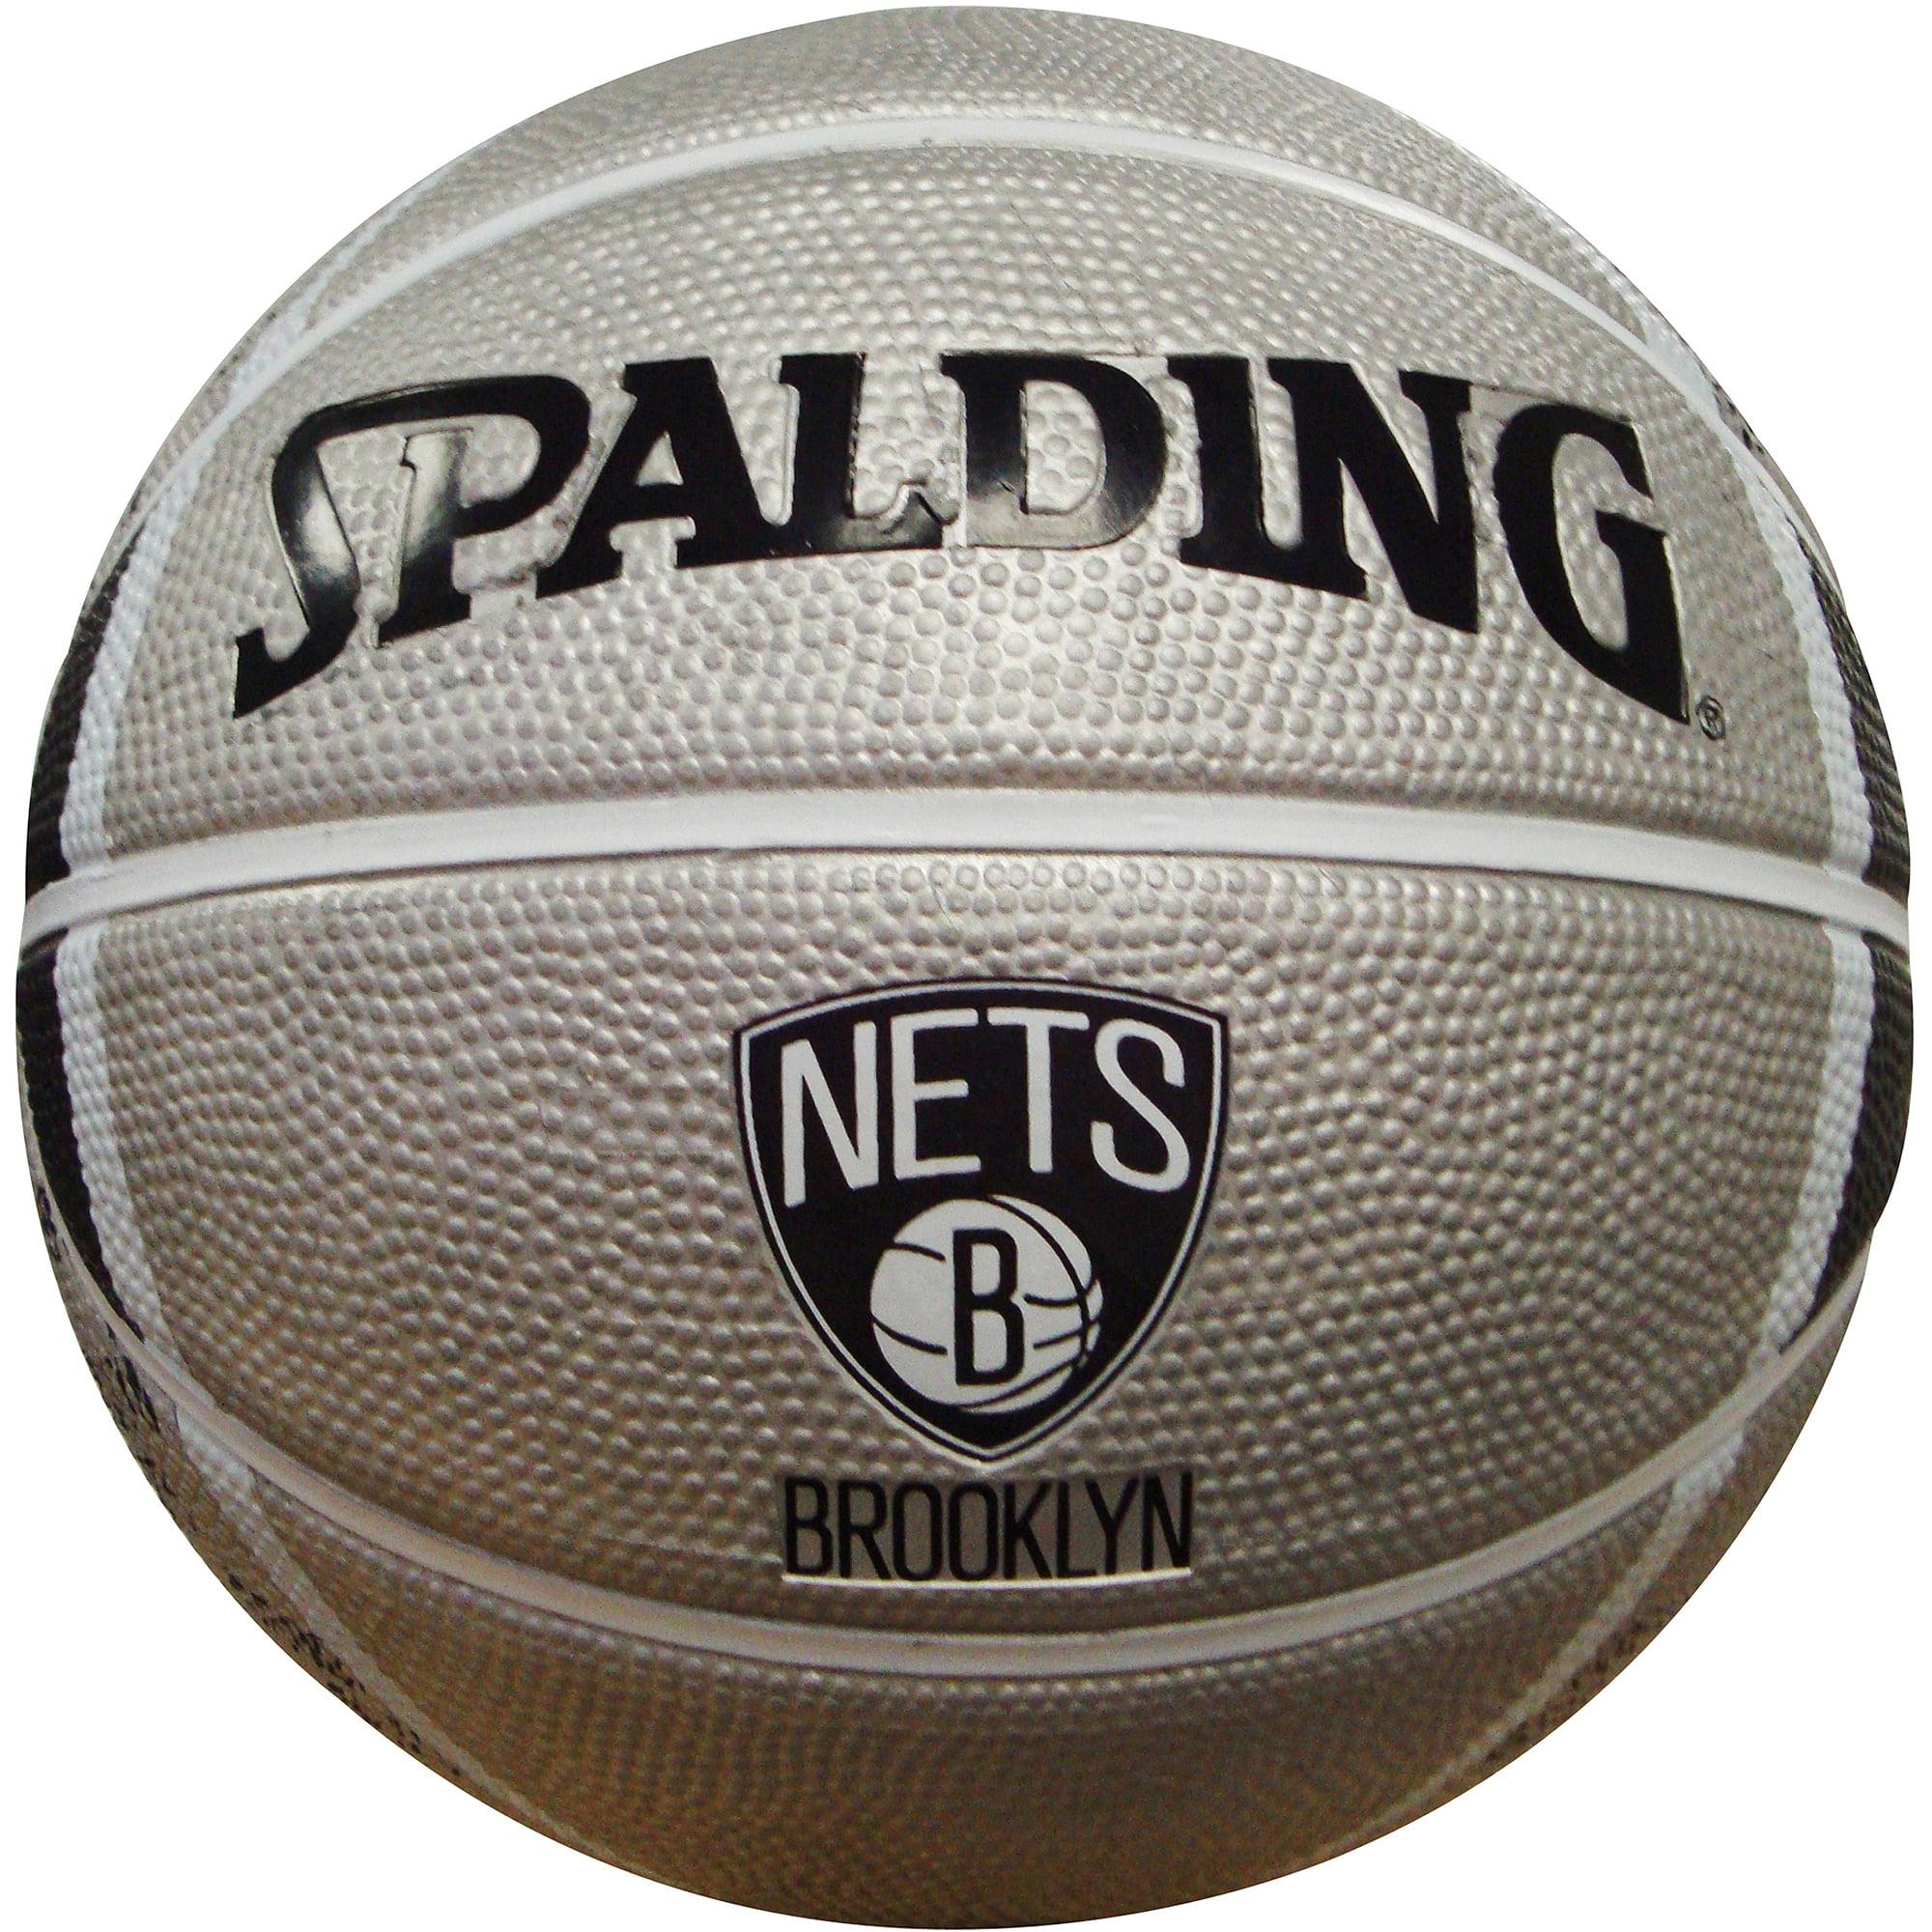 "Spalding NBA 7"" Mini Basketball, Brooklyn Nets by Spalding"